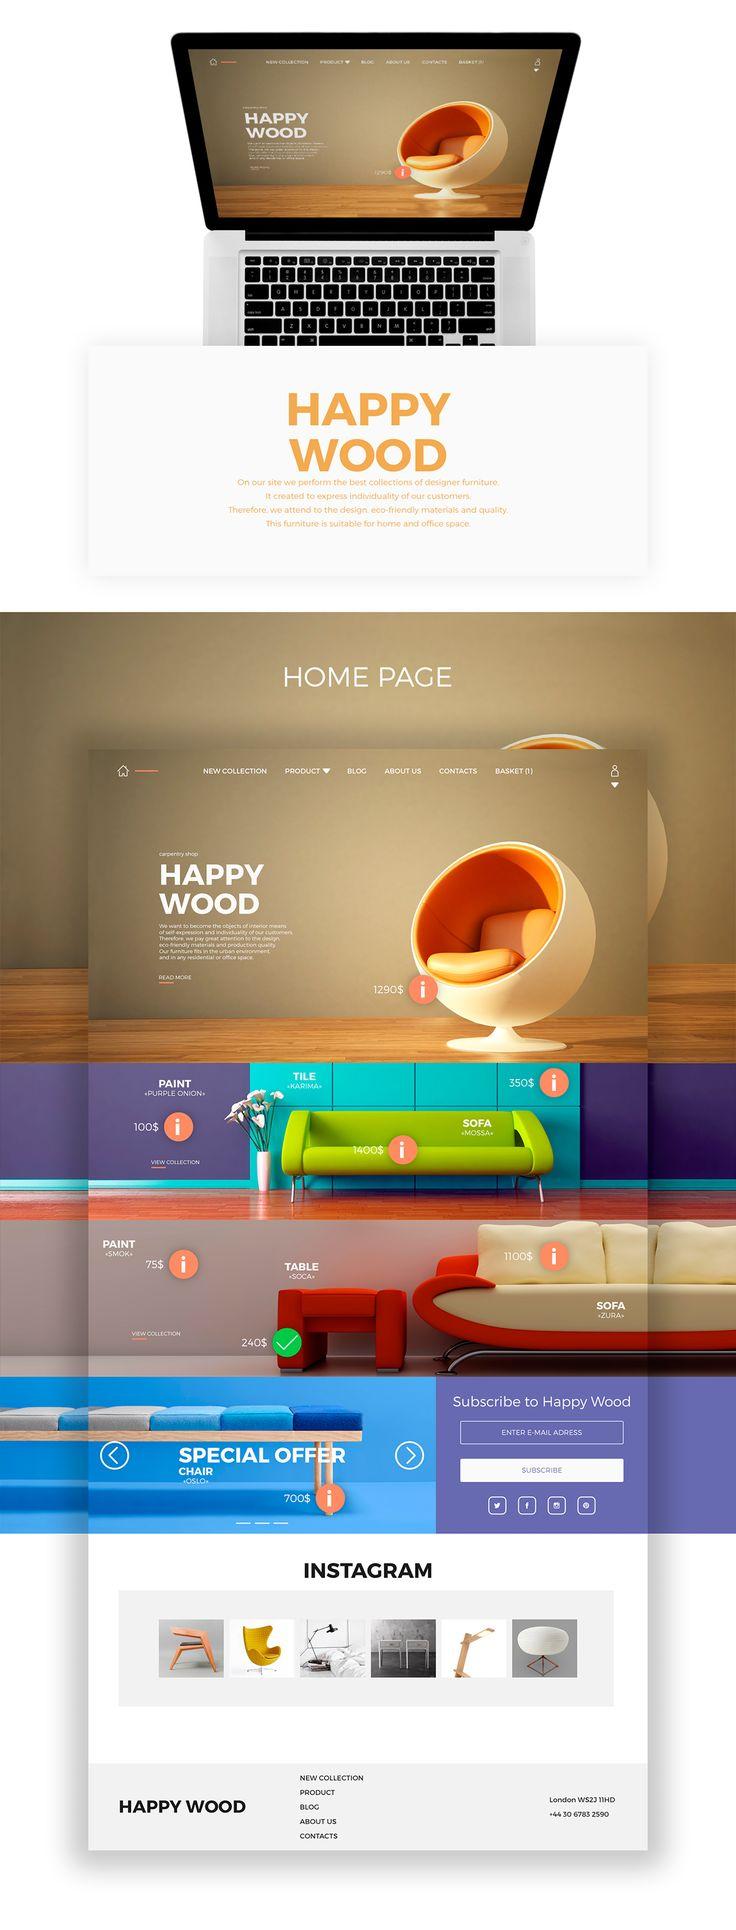 Online store interior goods «HAPPY WOOD» on Web Design Served